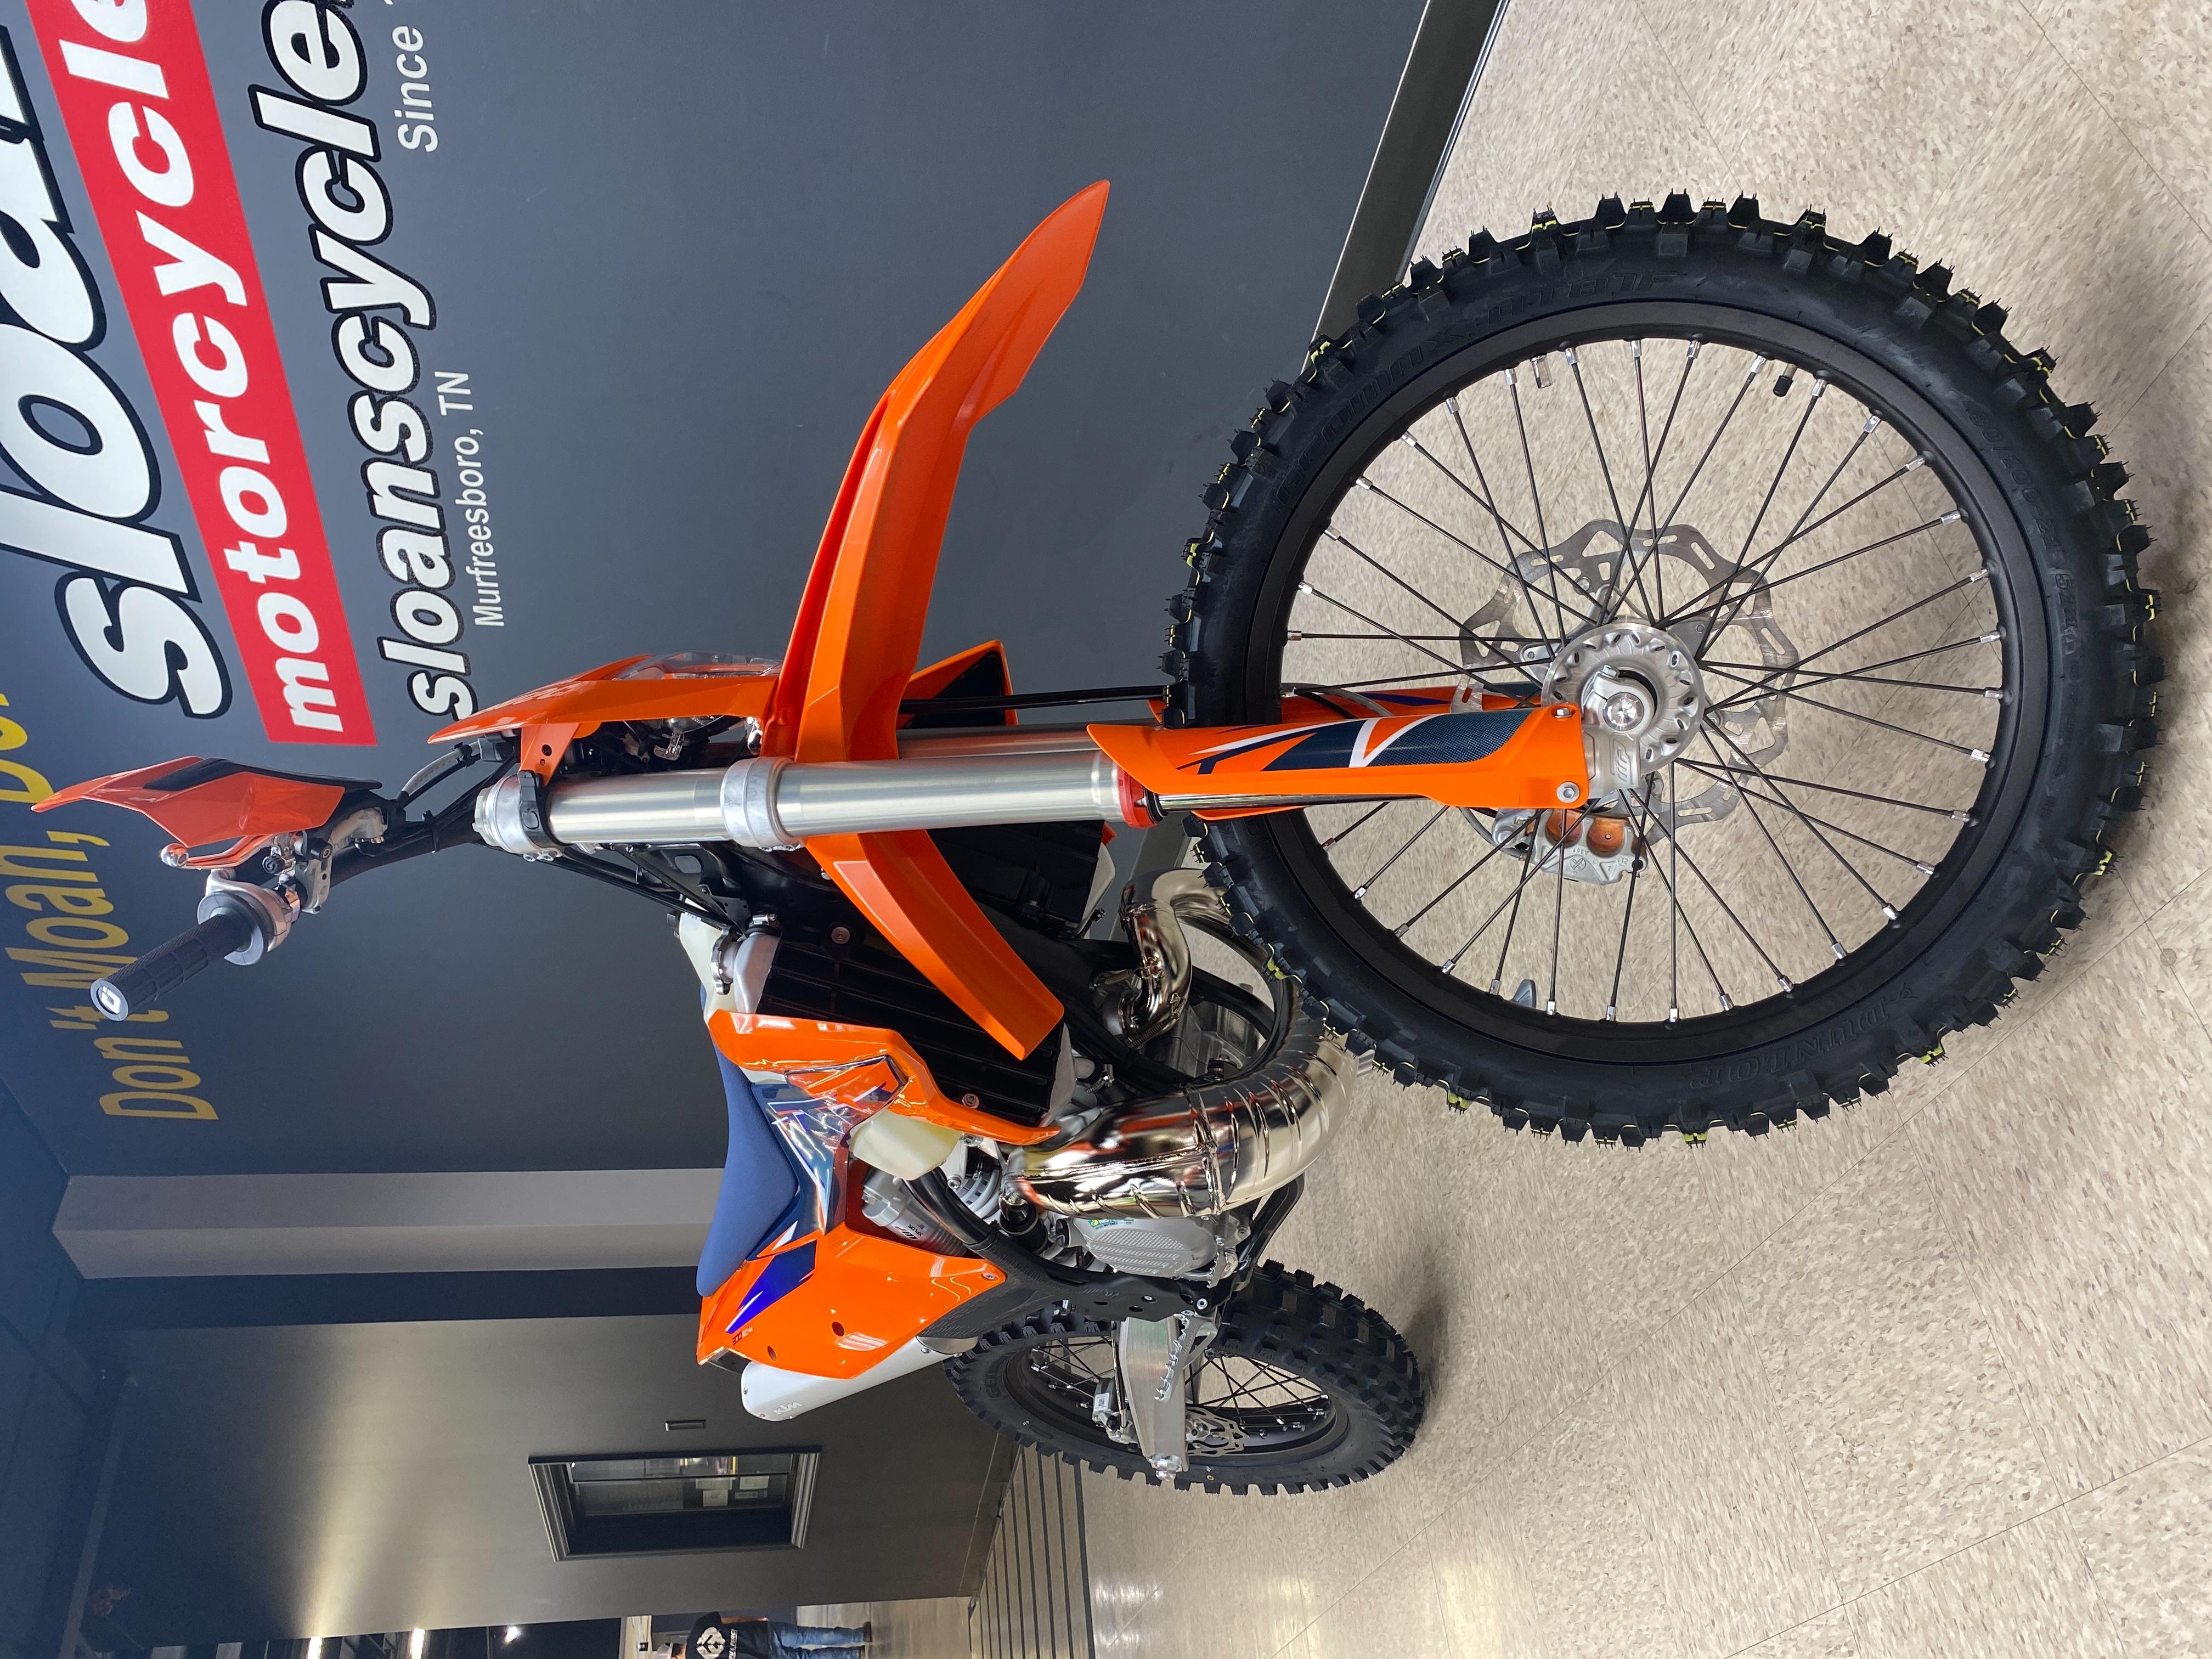 2022 KTM XC 300 W TPI at Sloans Motorcycle ATV, Murfreesboro, TN, 37129